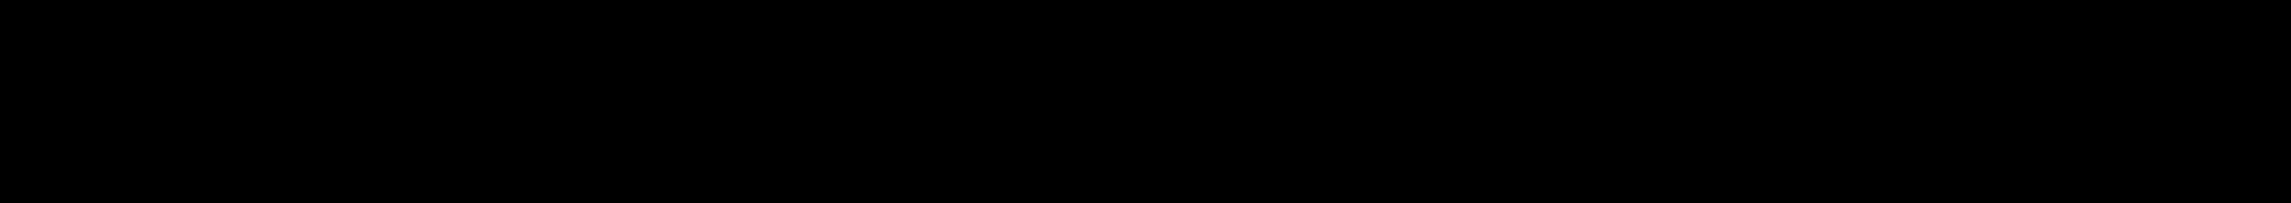 Copperplate Modern Plain